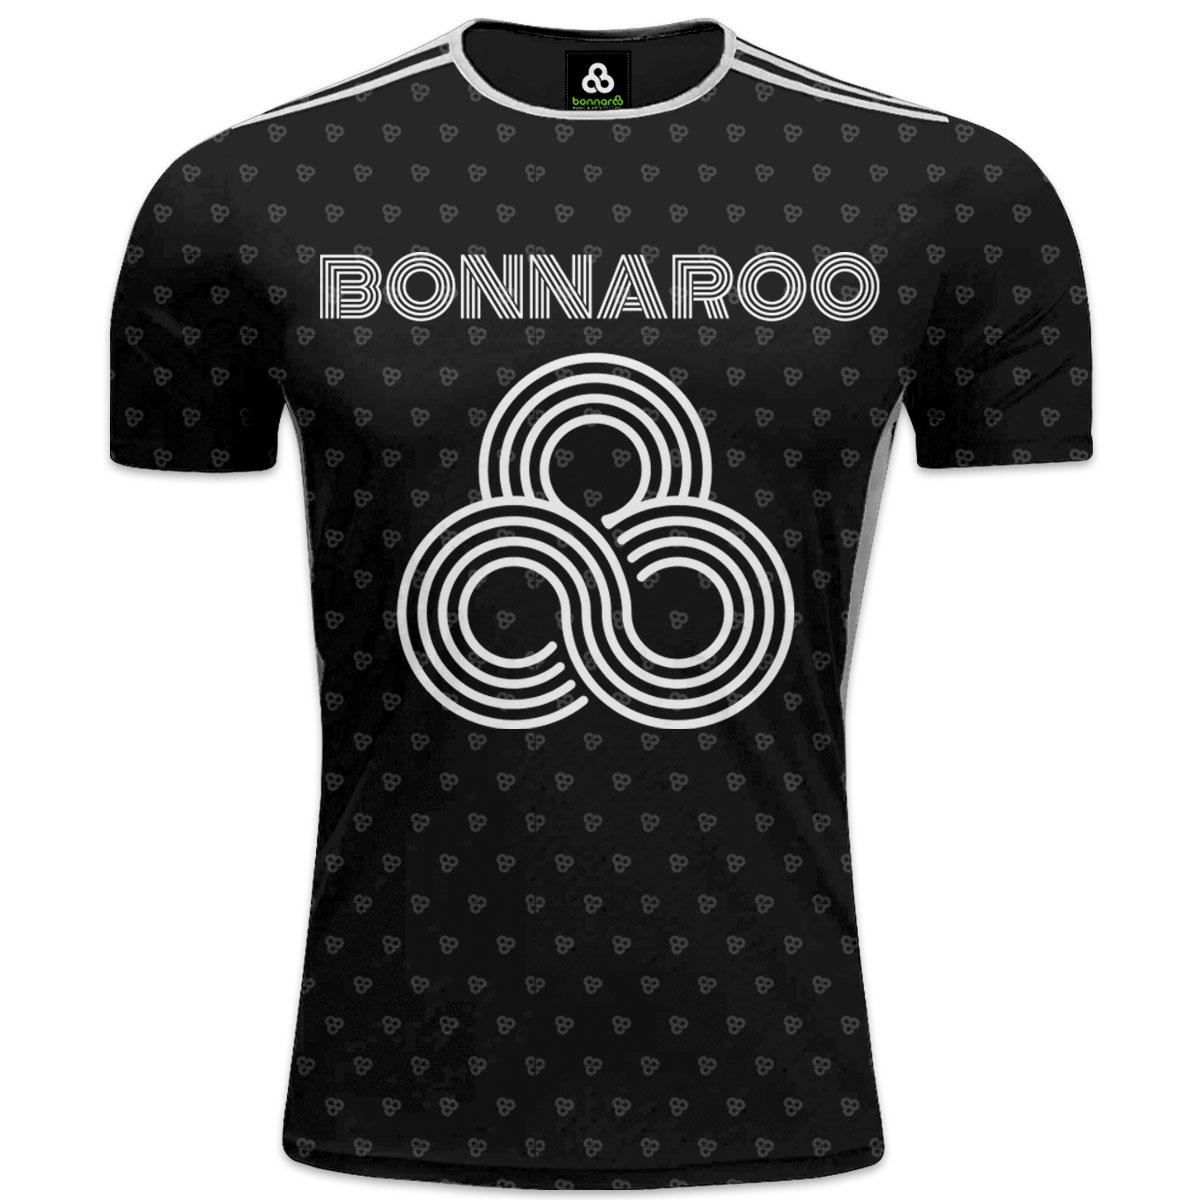 Bonnaroo 2021 Soccer Jersey